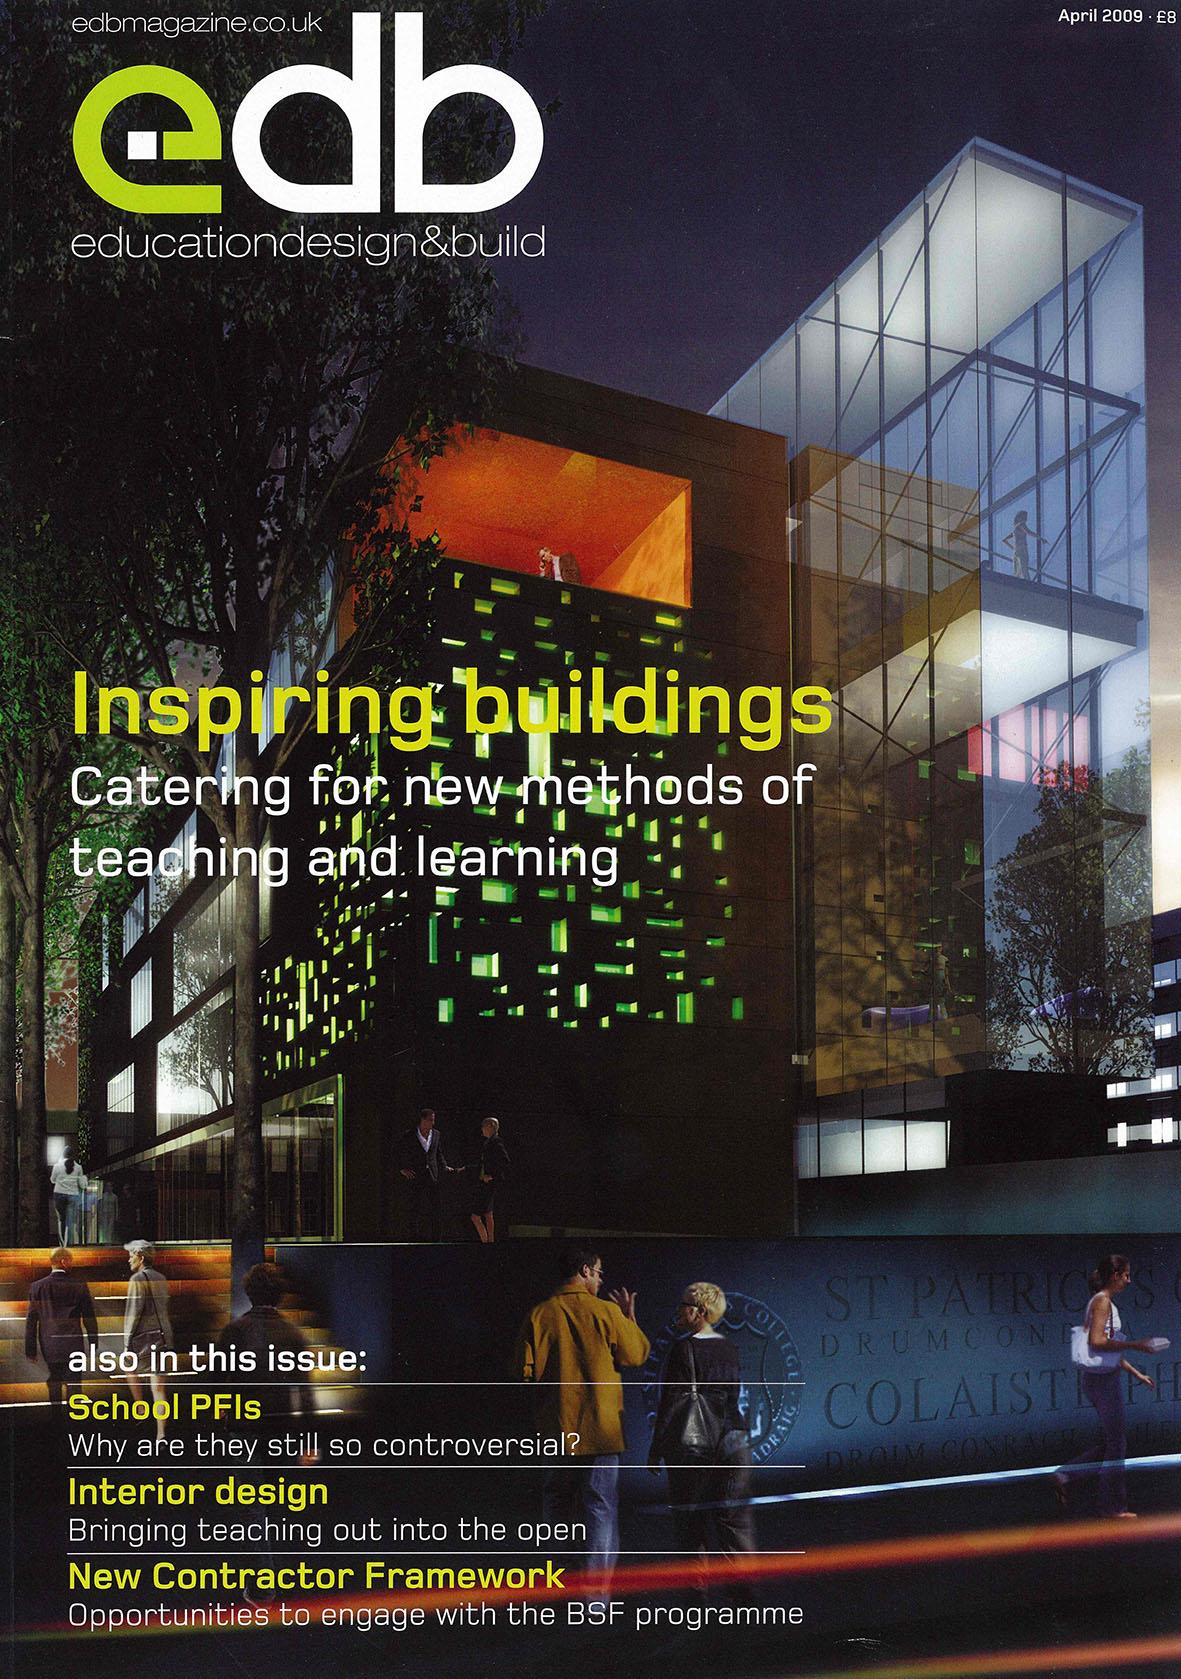 Education Design & Build 2009